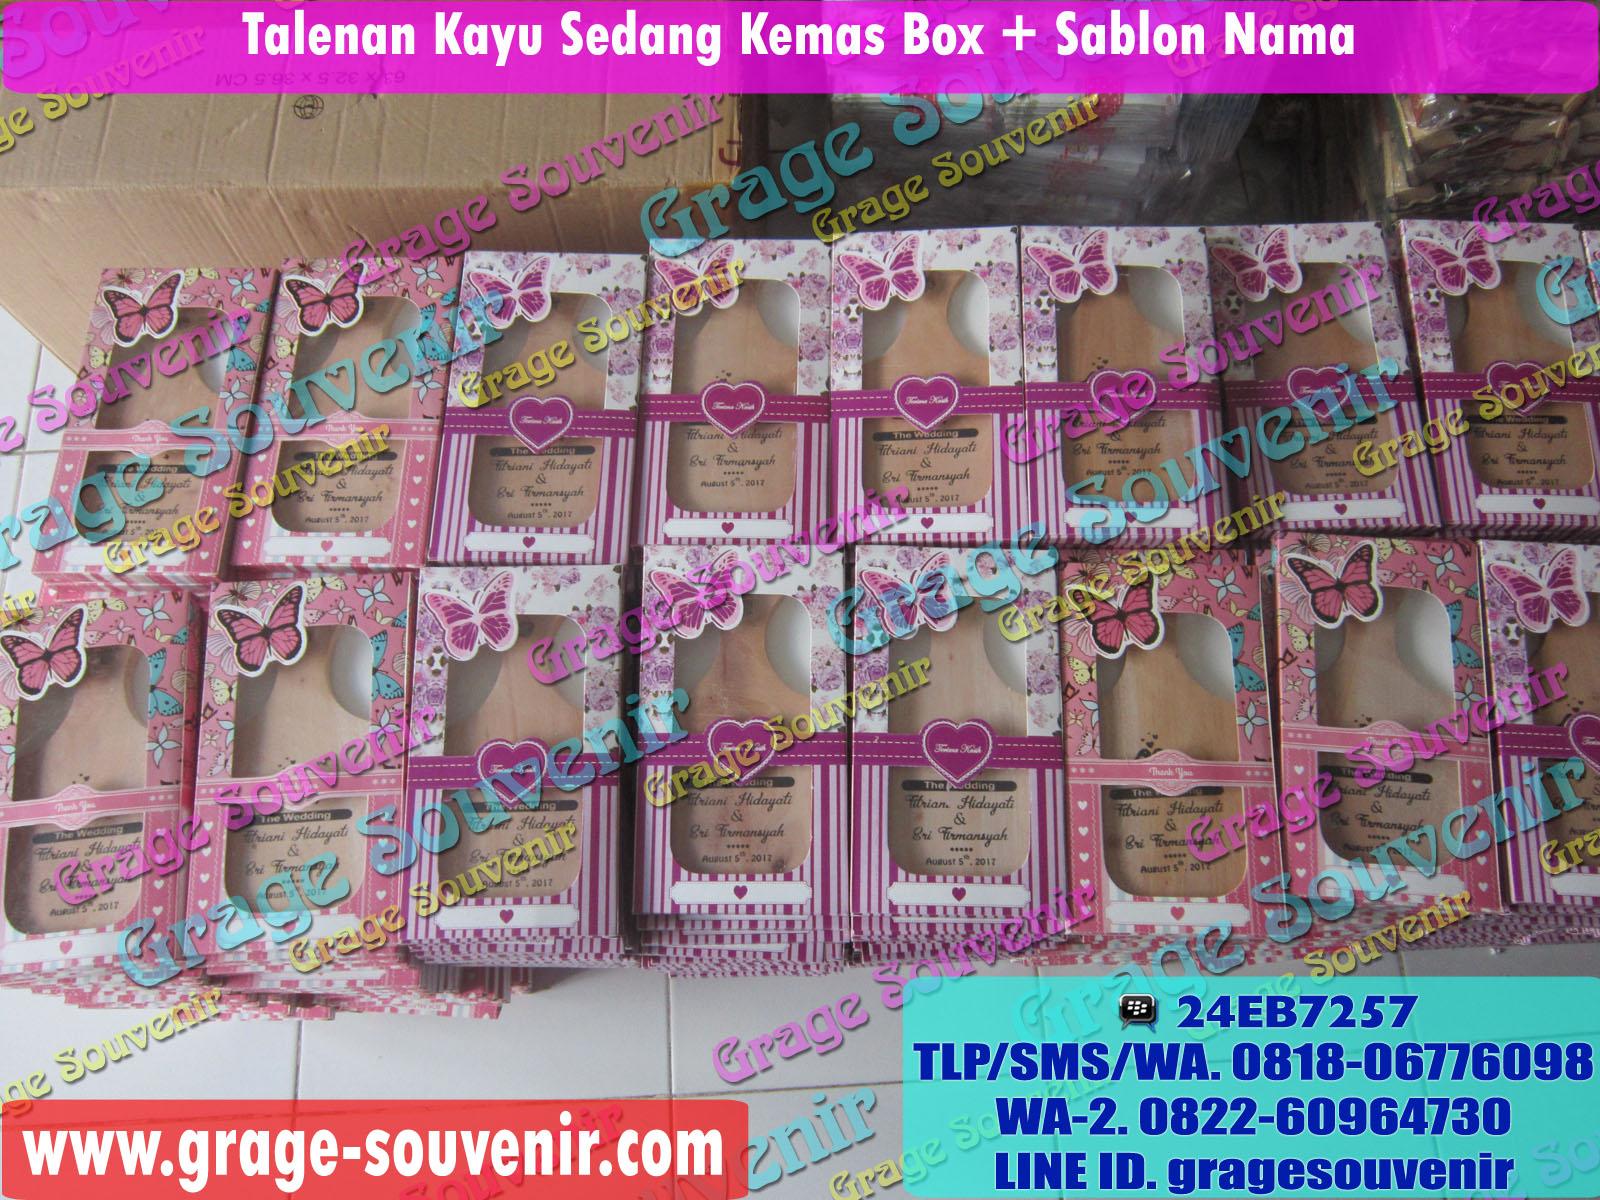 Grosir Talenan Kayu Murah Kemas Box